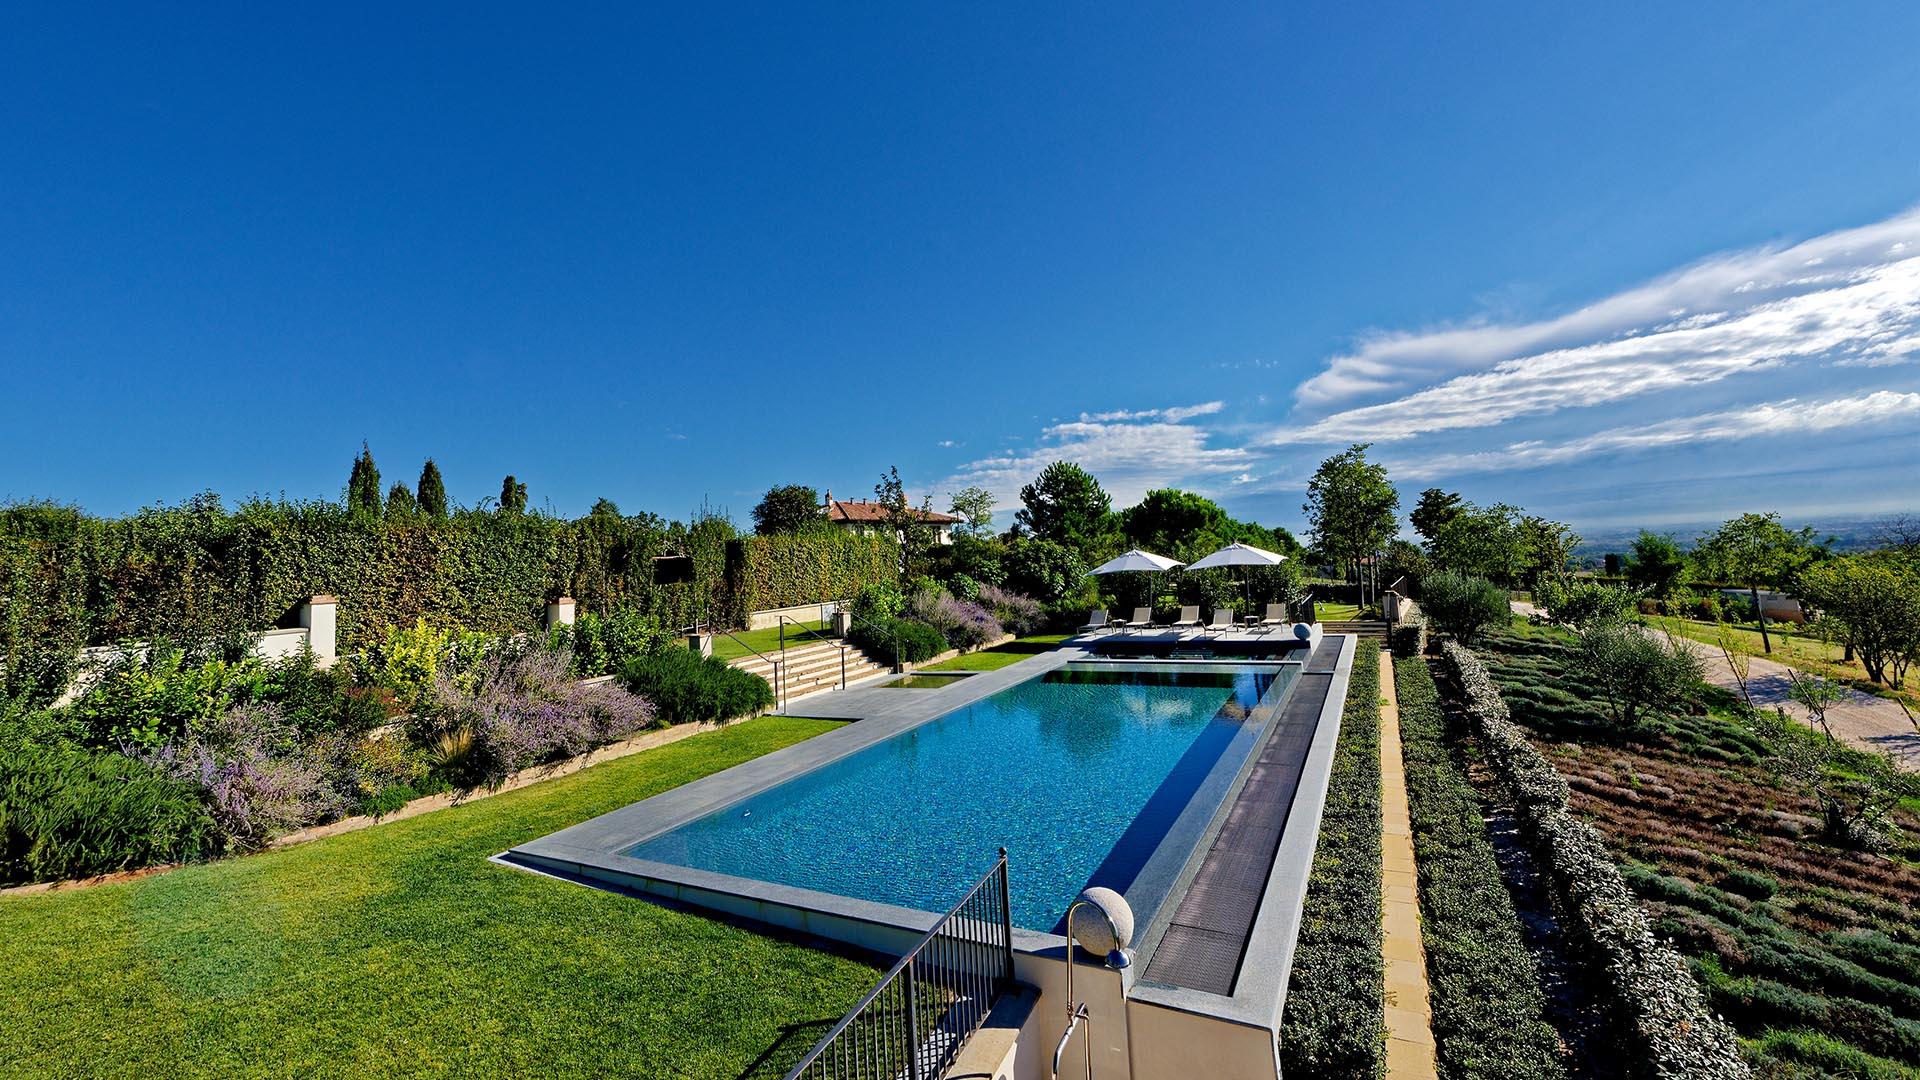 Villa Amagioia